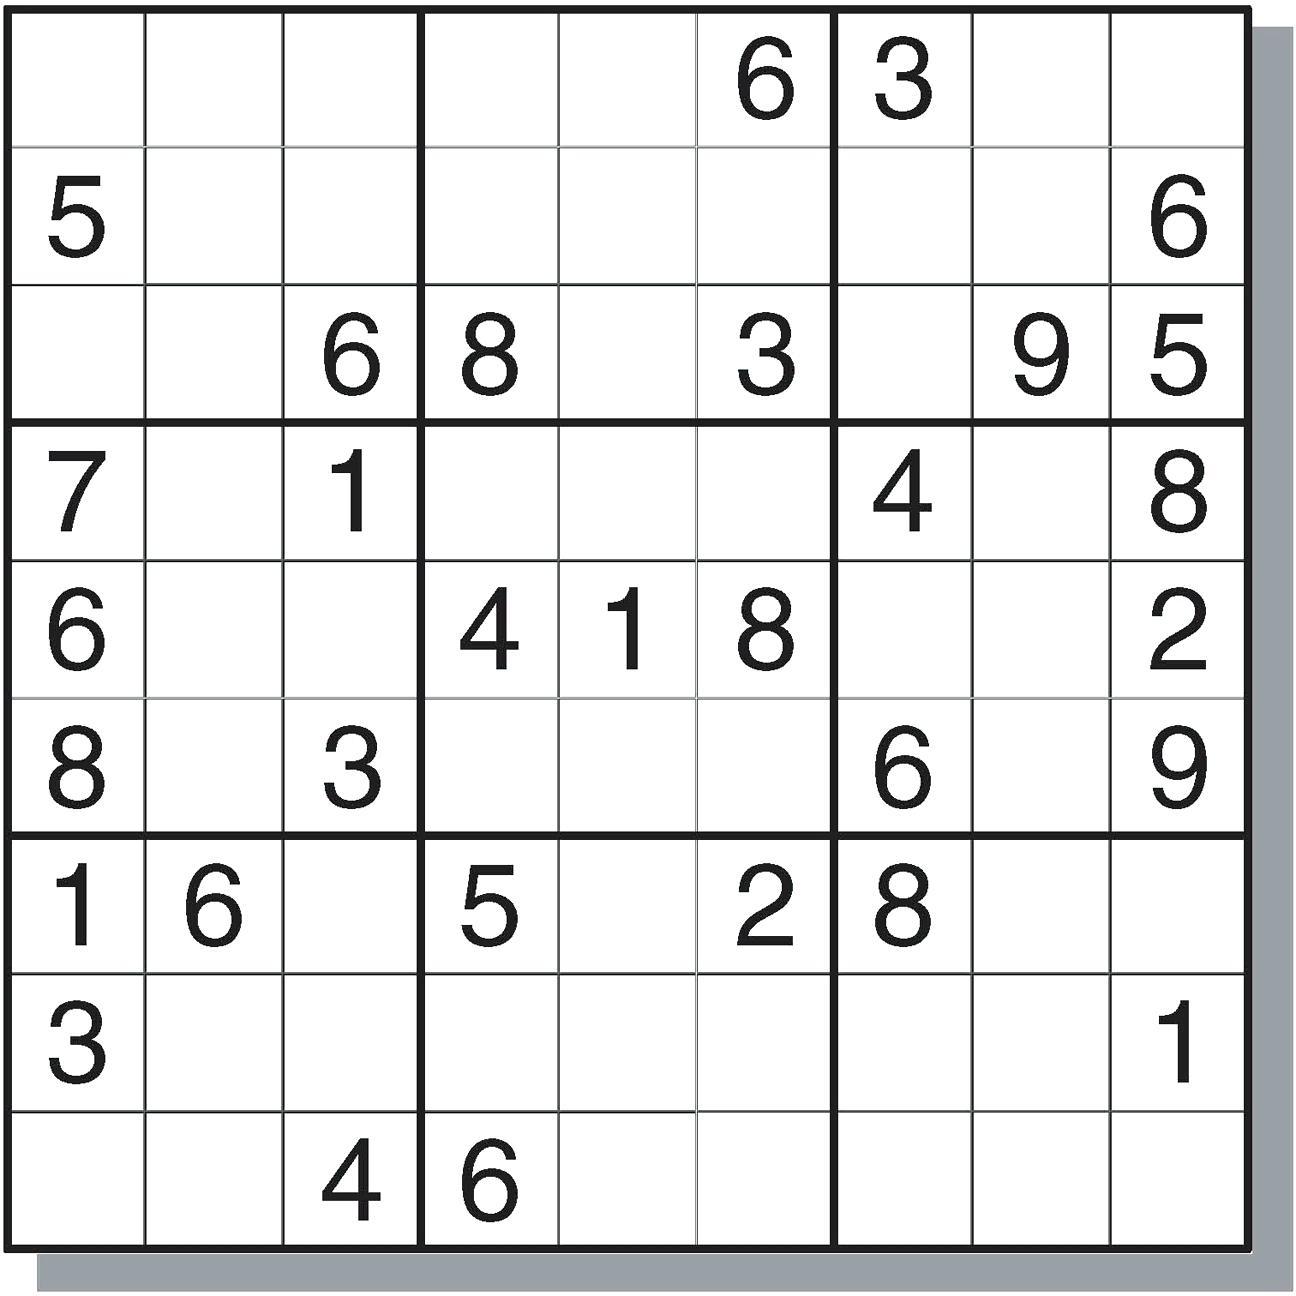 Sudoku Online - Ecosia - Free Printable Sudoku With Answers